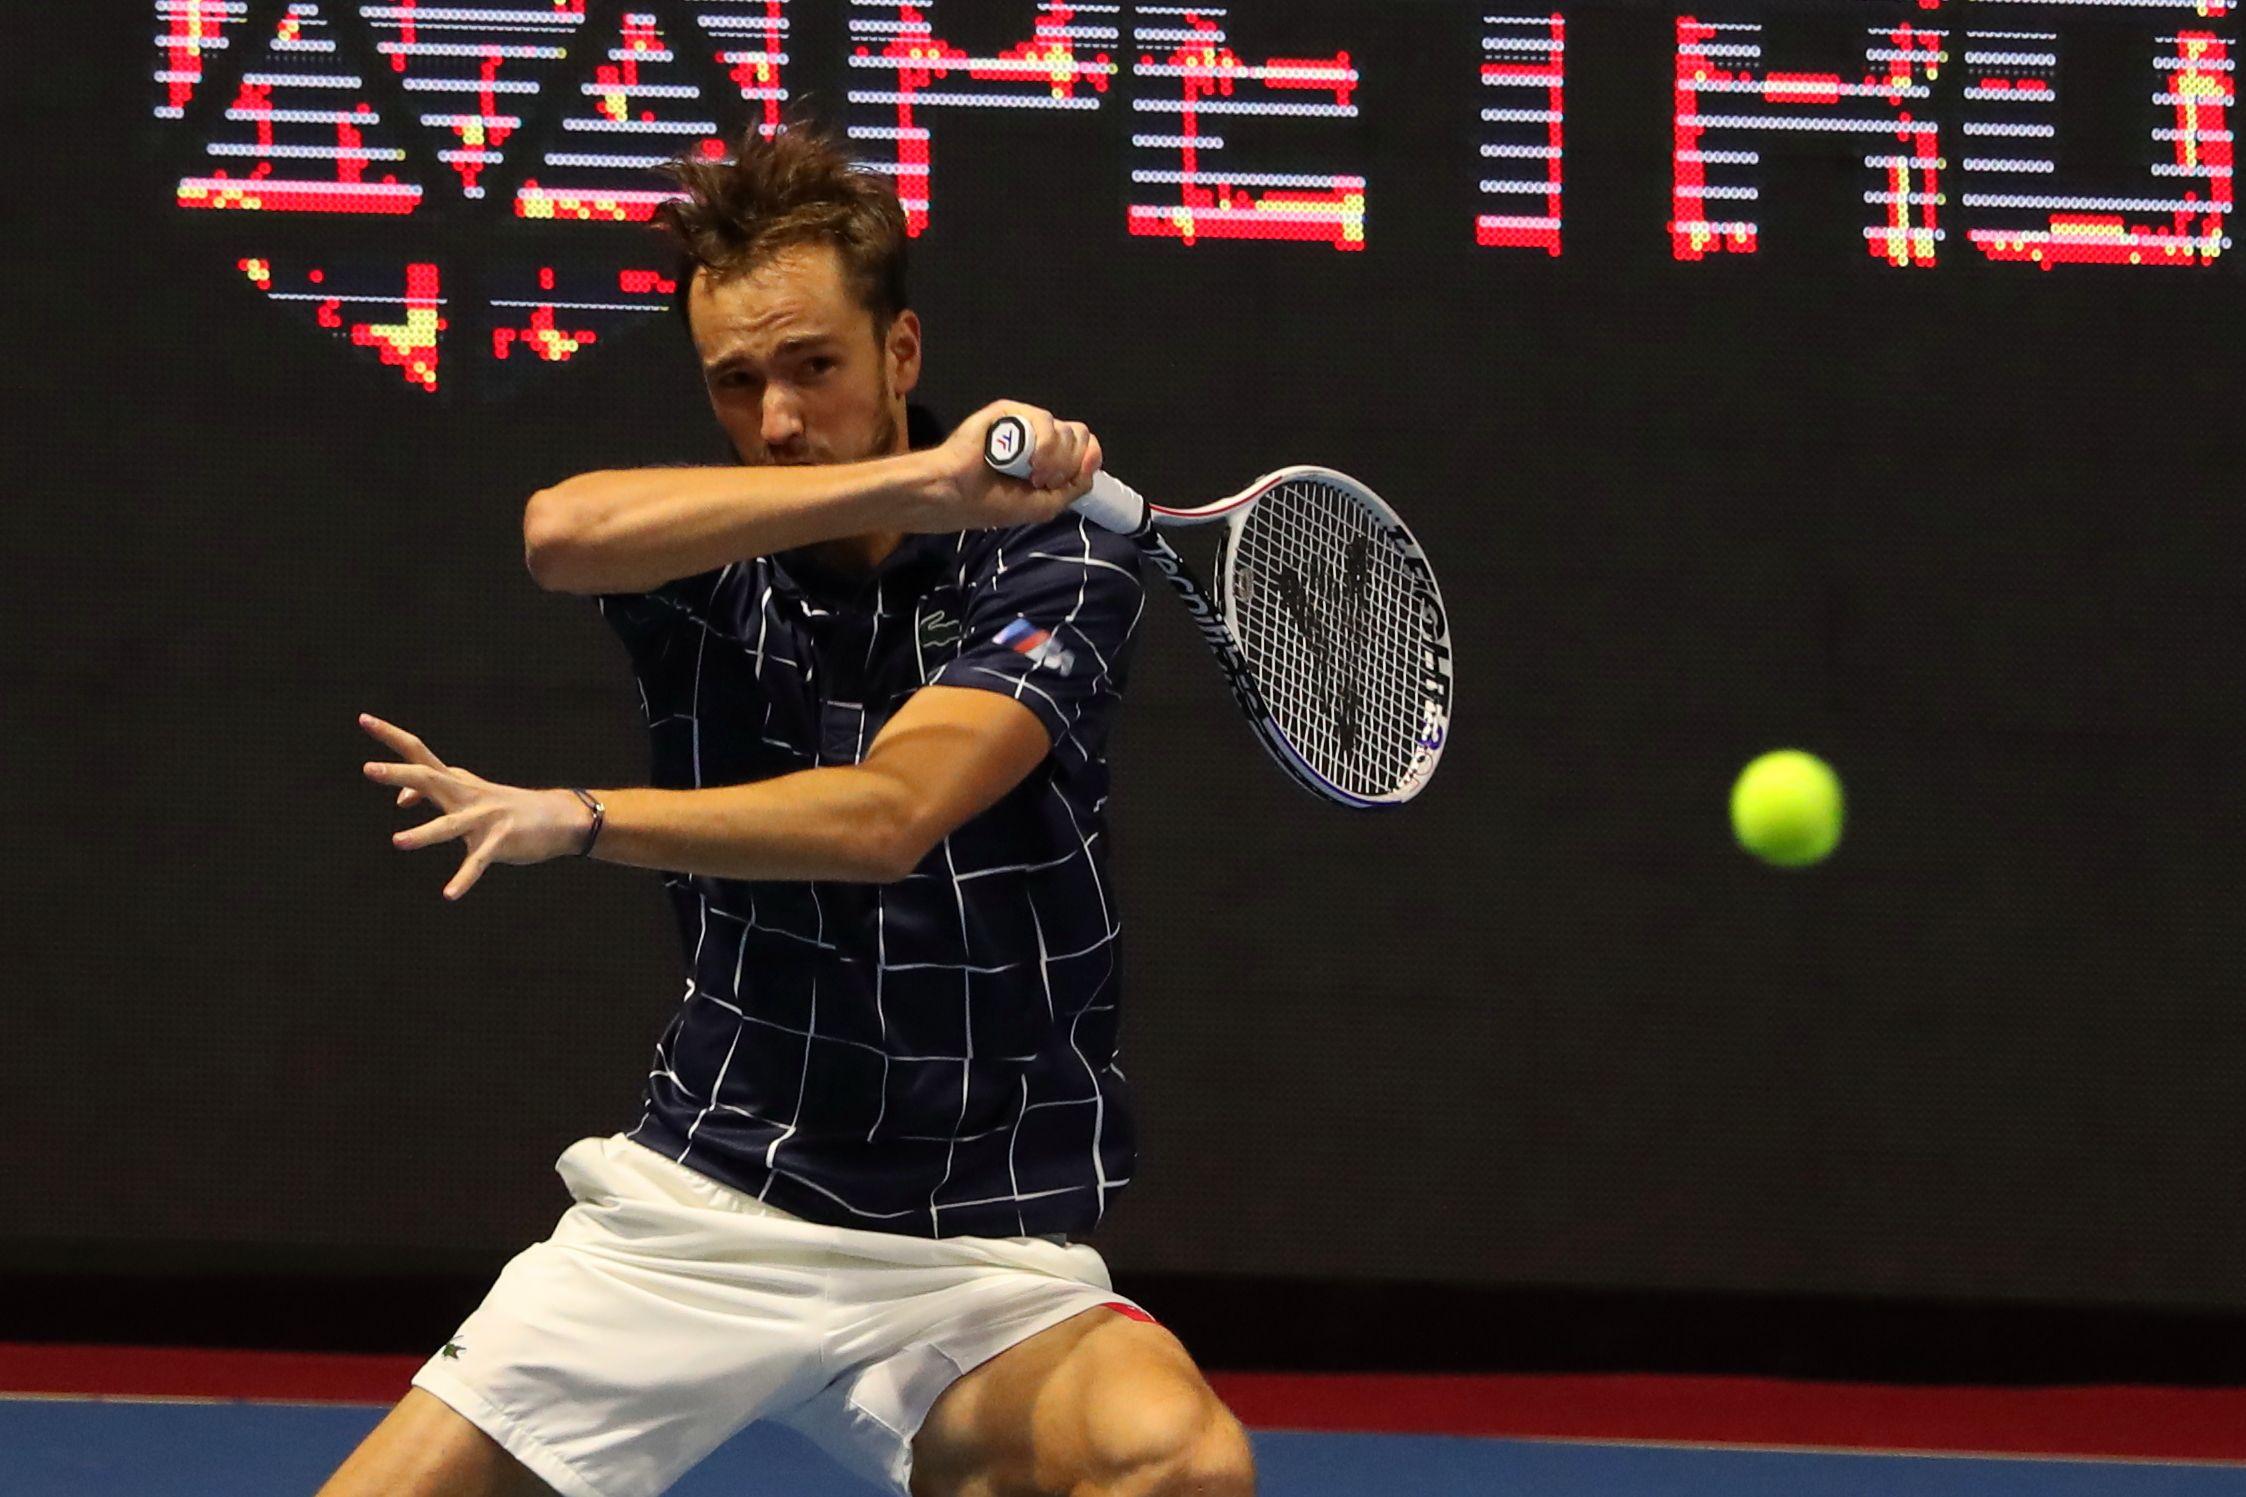 Теннис, АТР, Париж, третий круг, Медведев - Де Минаур, прямая текстовая онлайн трансляция